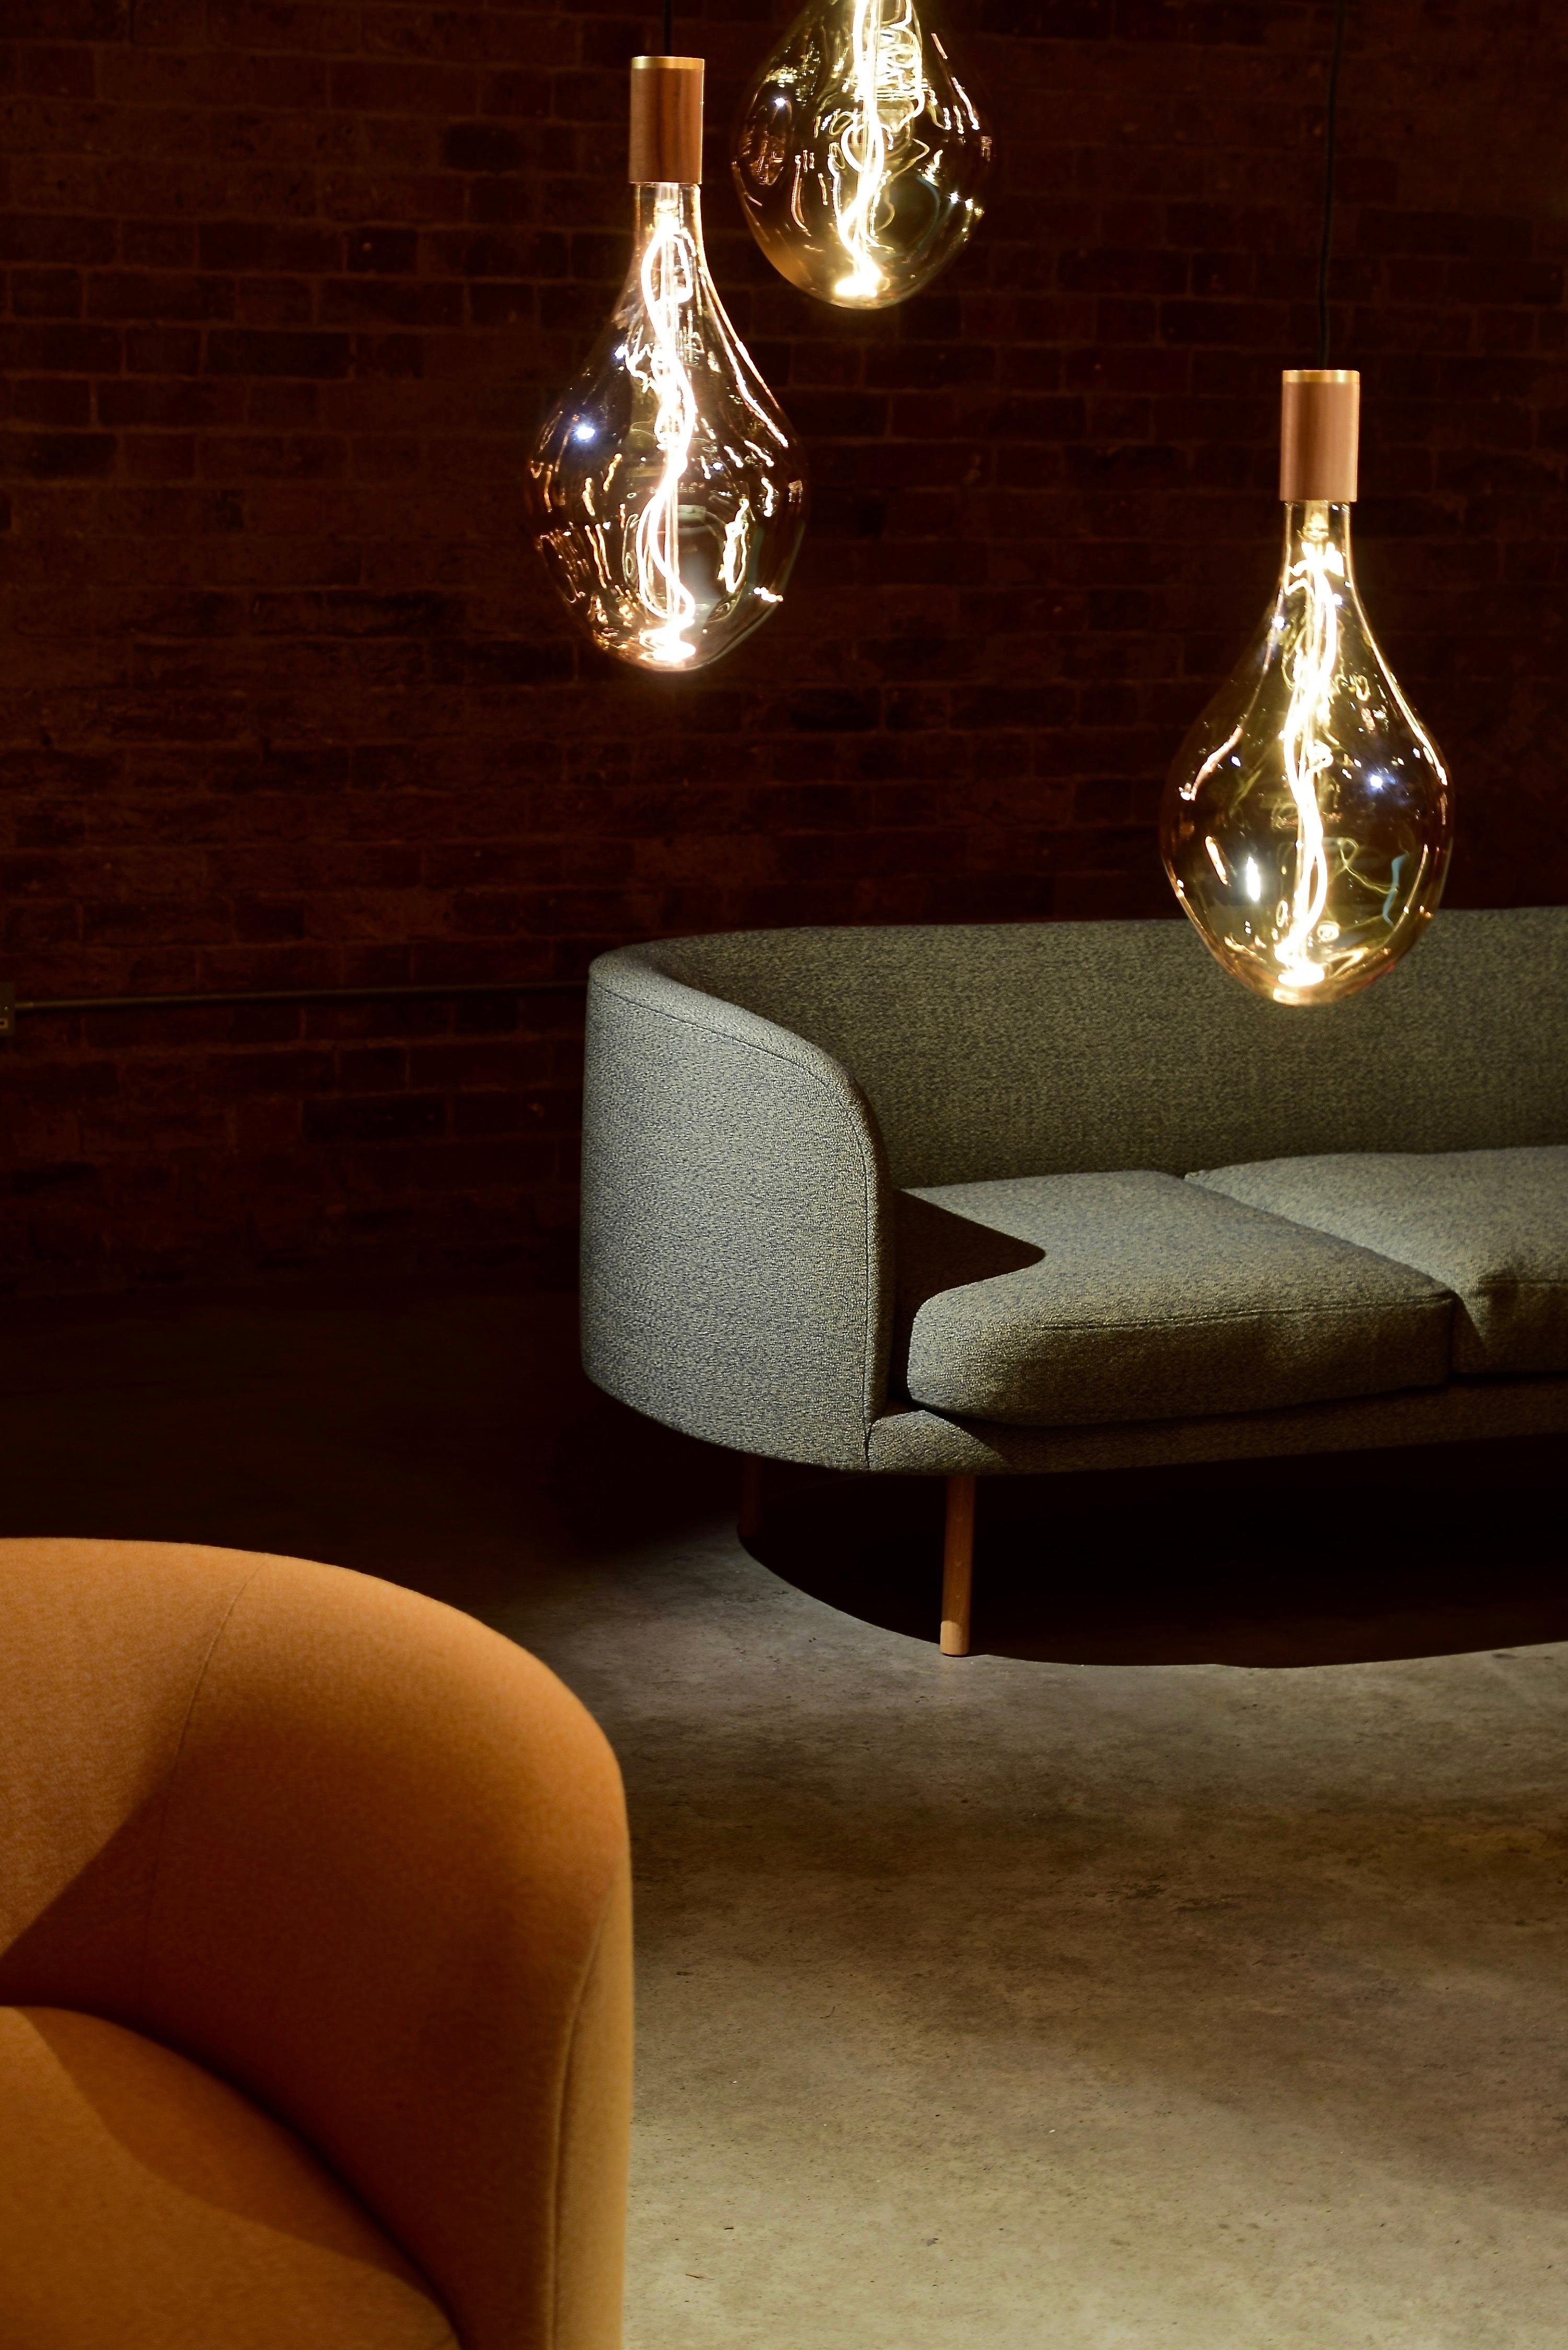 Three Edison Light Bulbs Beside the Sofa